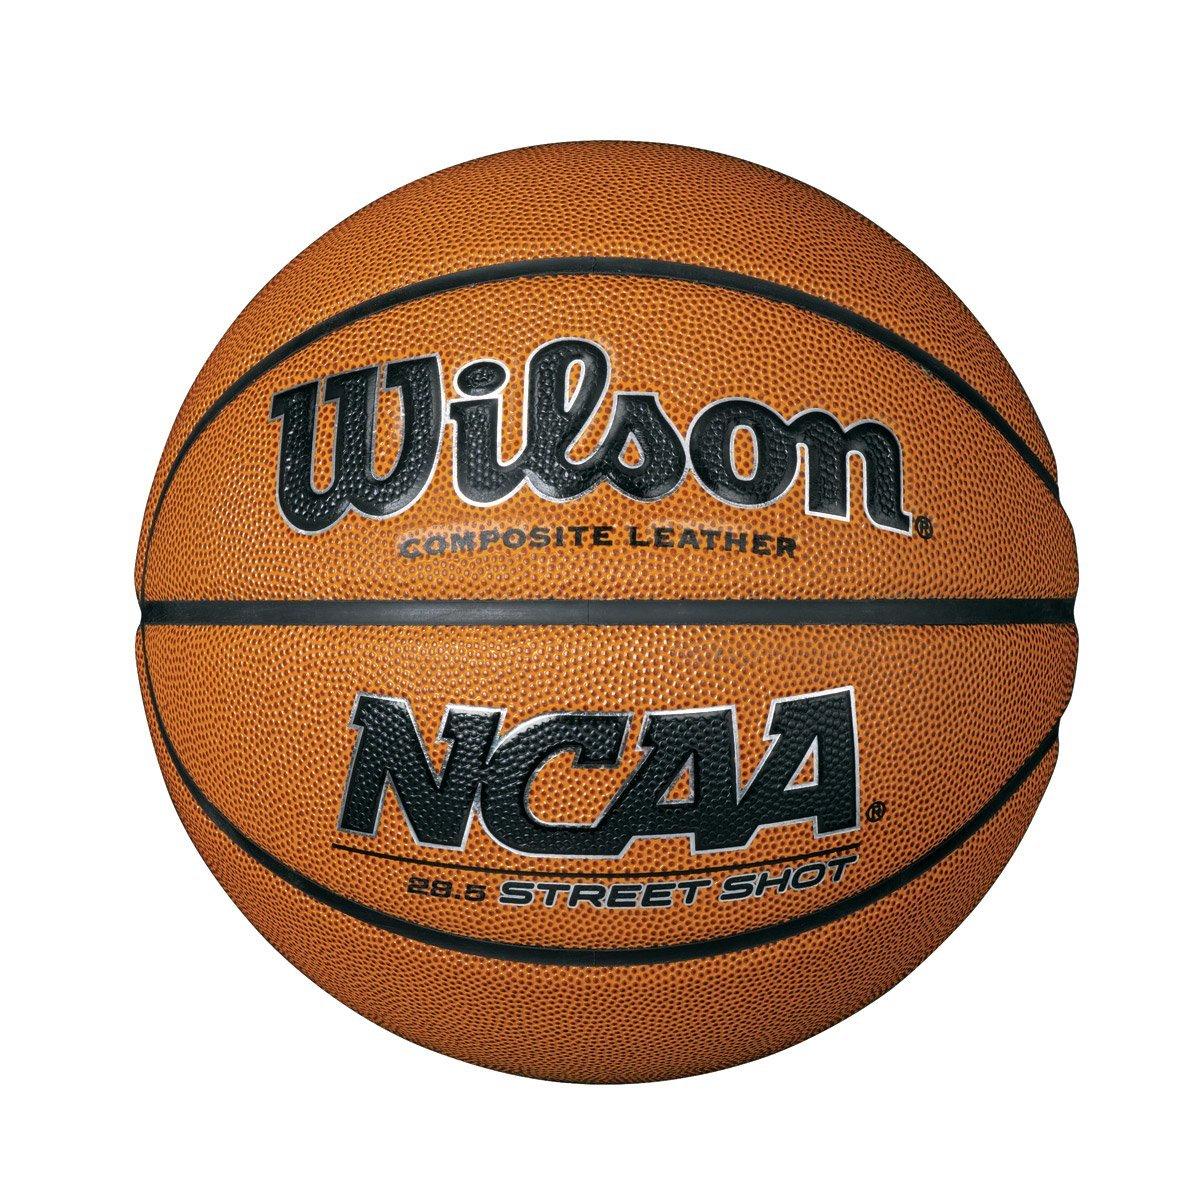 Wilson NCAA Street Shot Basketball .jpg